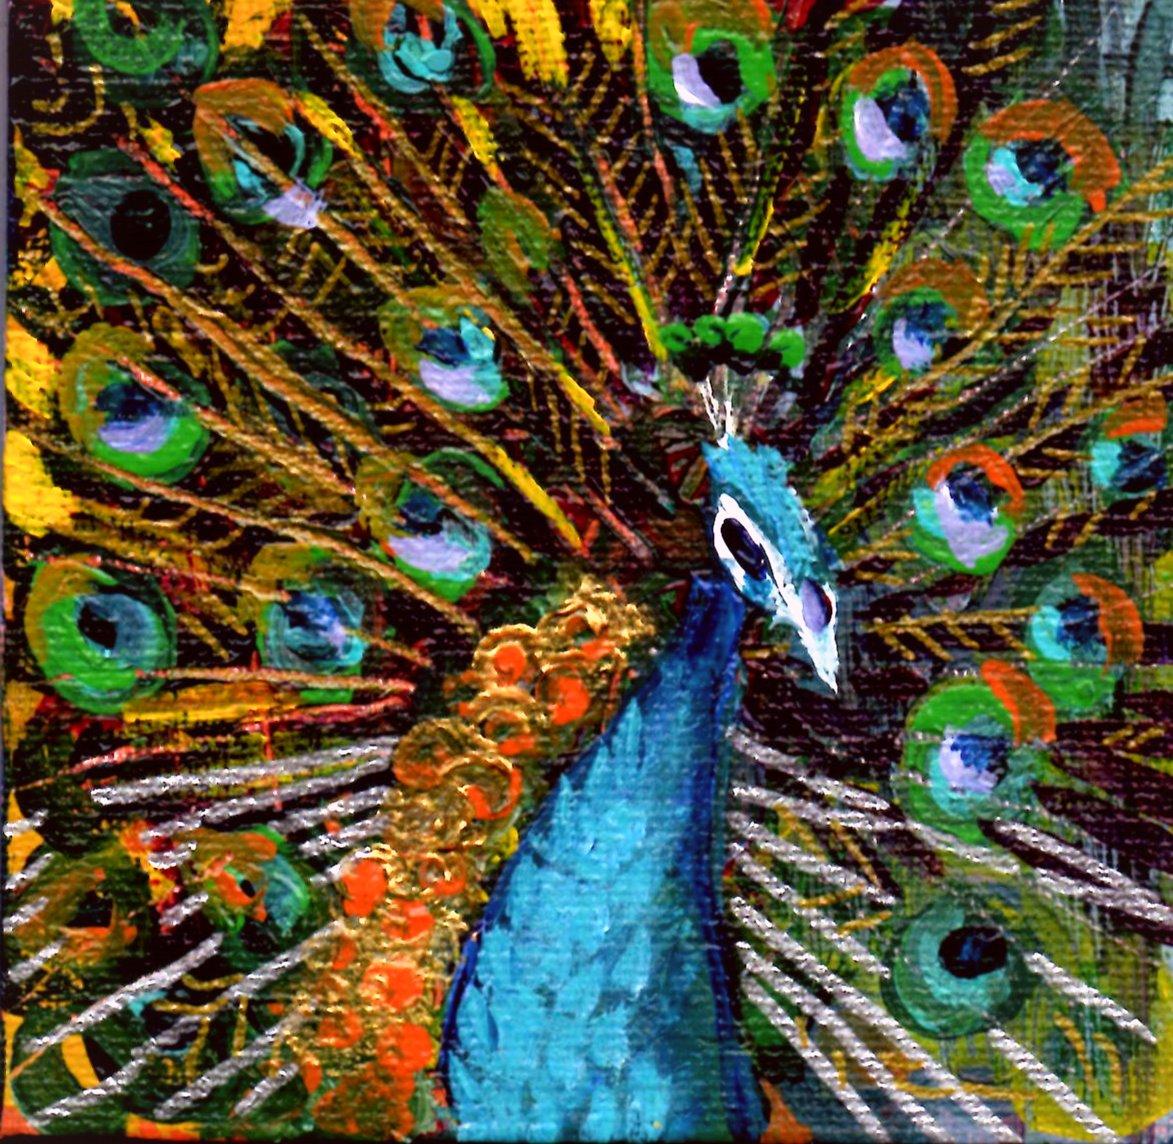 Evening Peacock